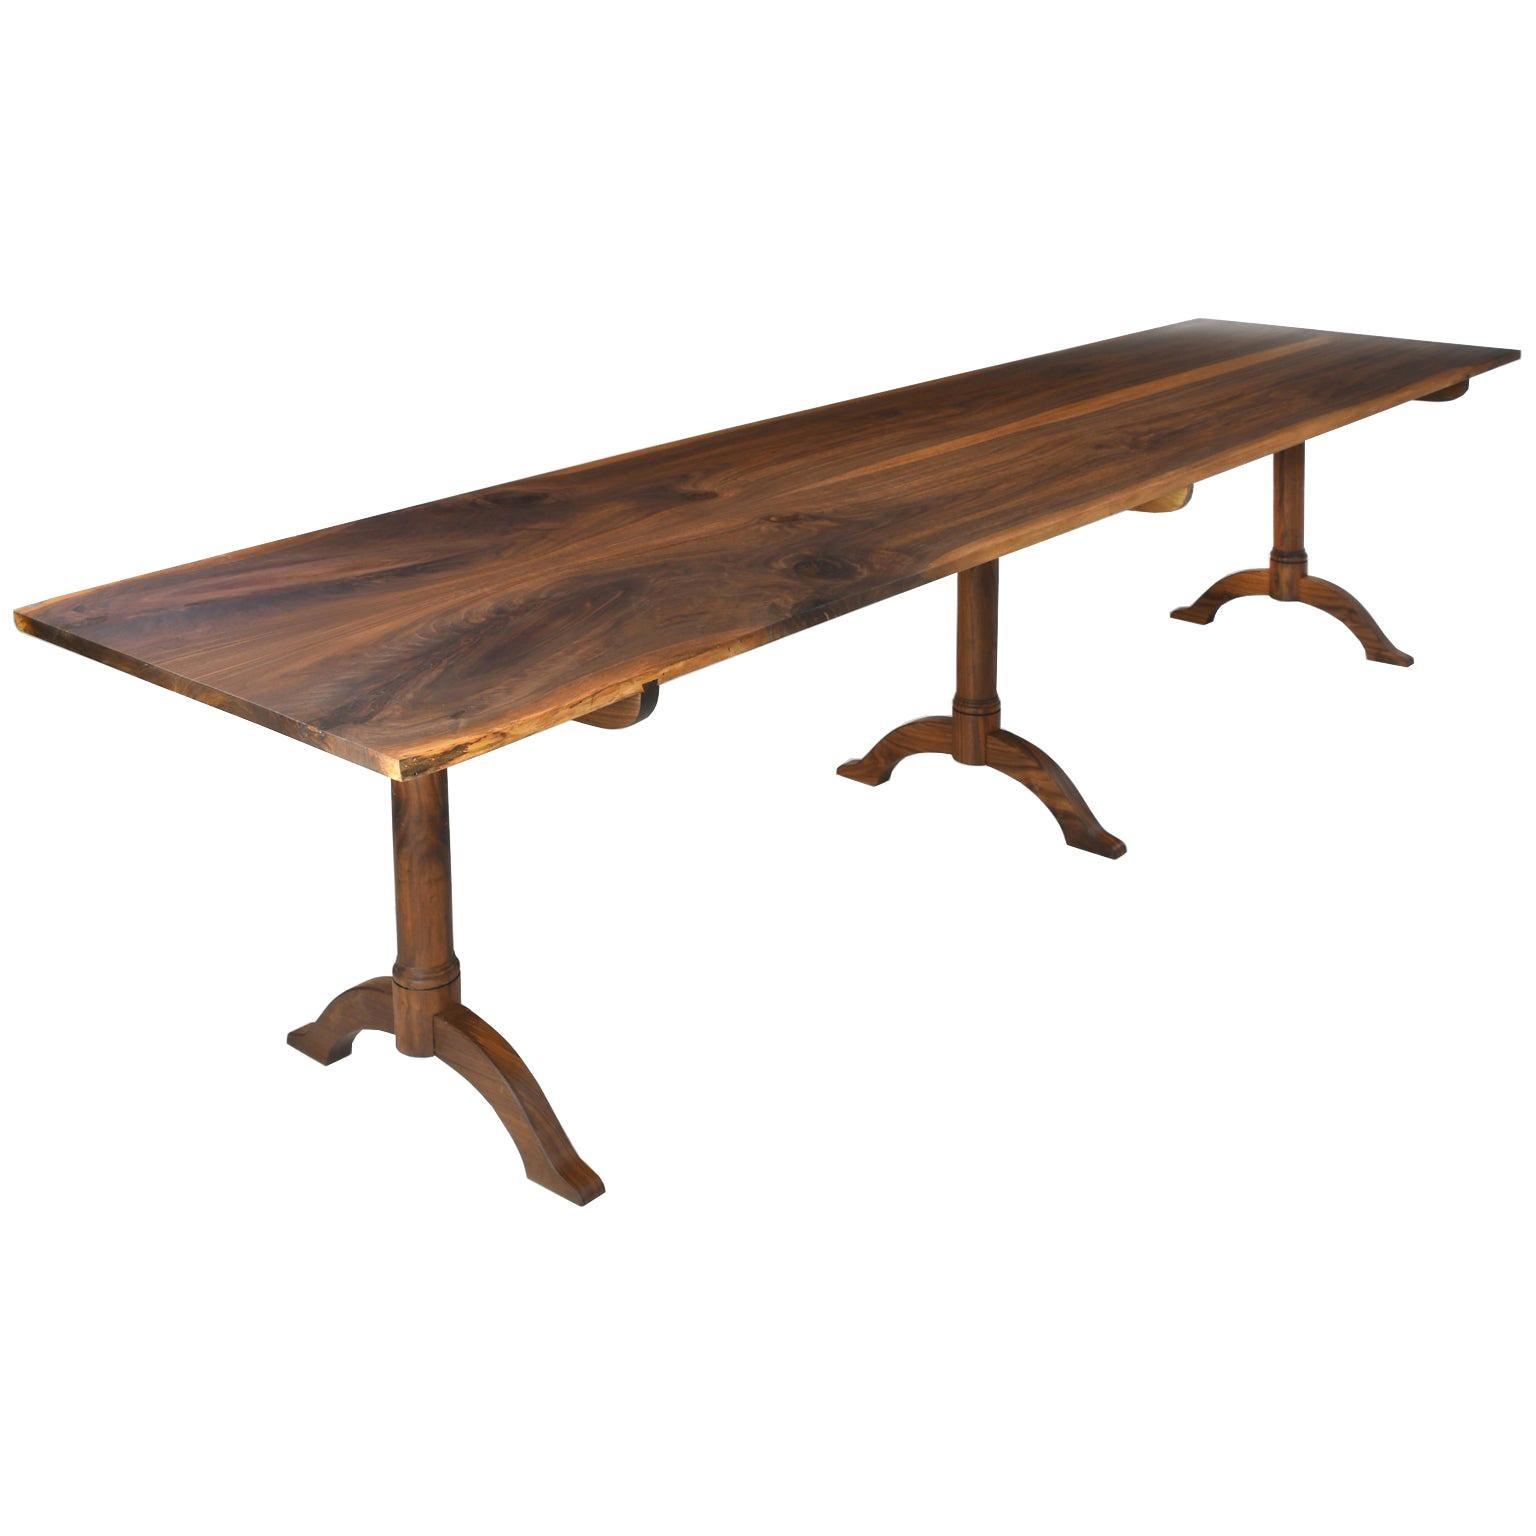 Bonnin Ashley Custom-Made Dining Table in Black Walnut w/ Hand Rubbed Oil Finish